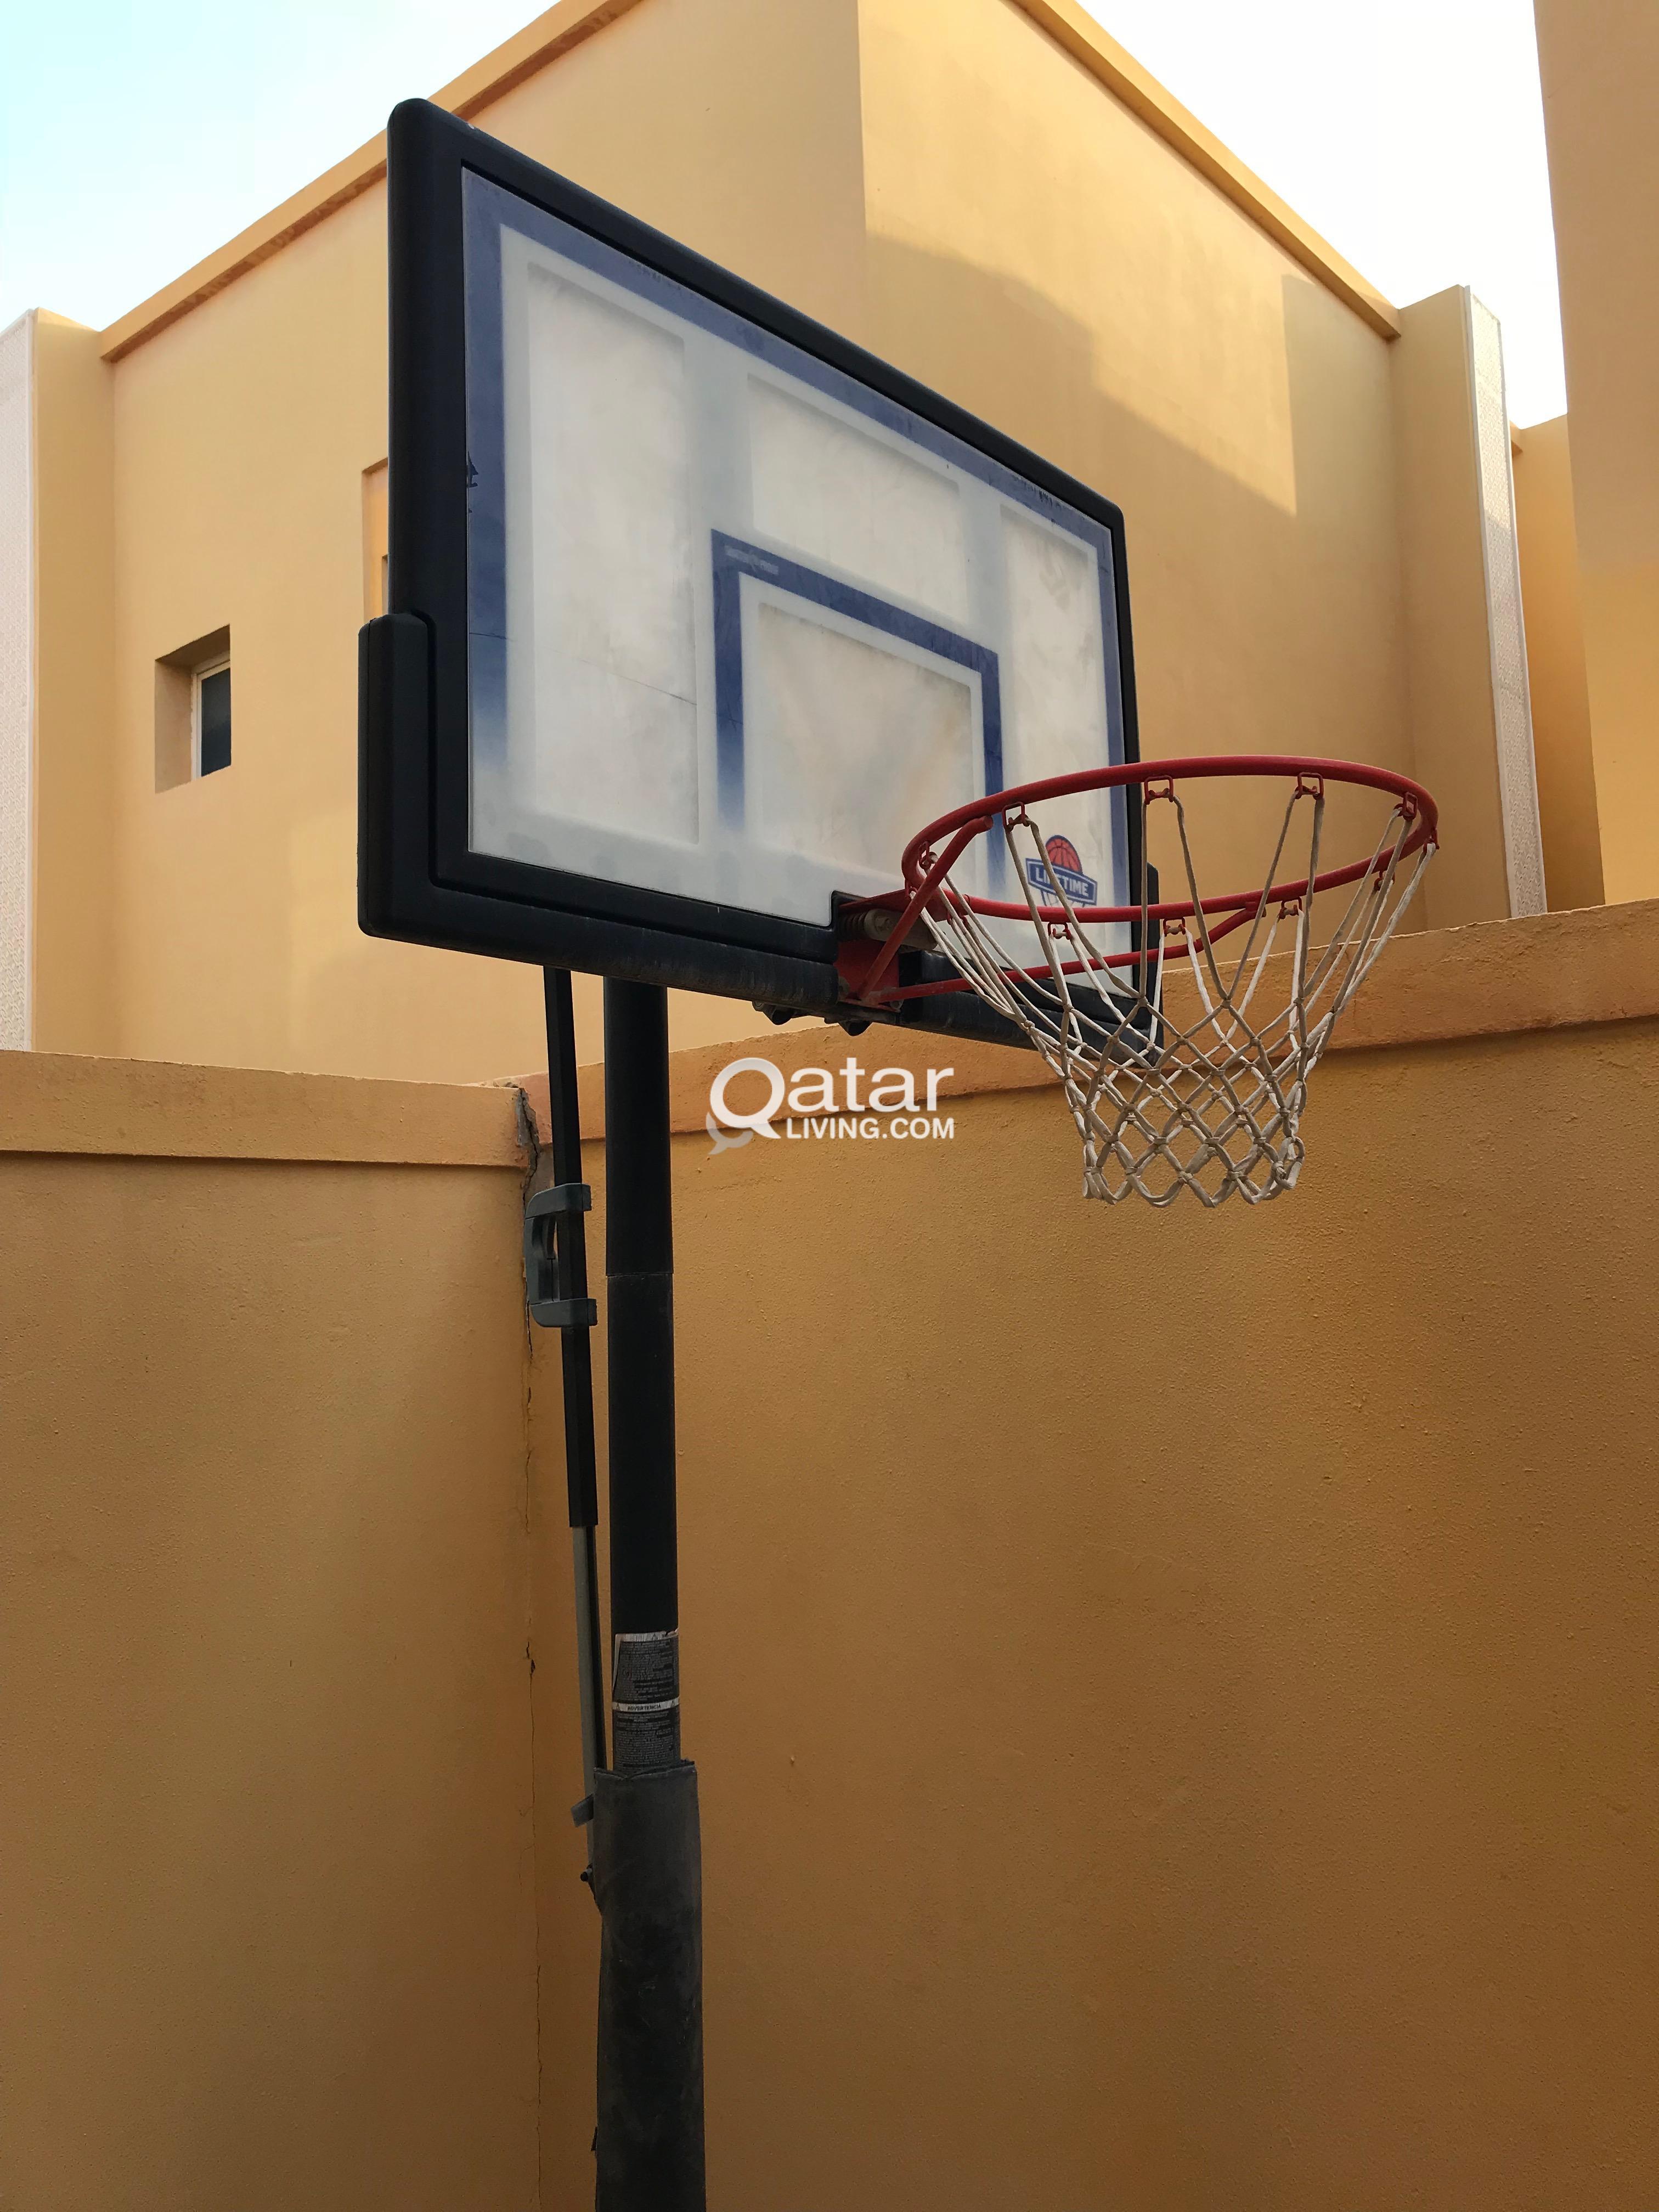 Basketball Hoop Qatar Living